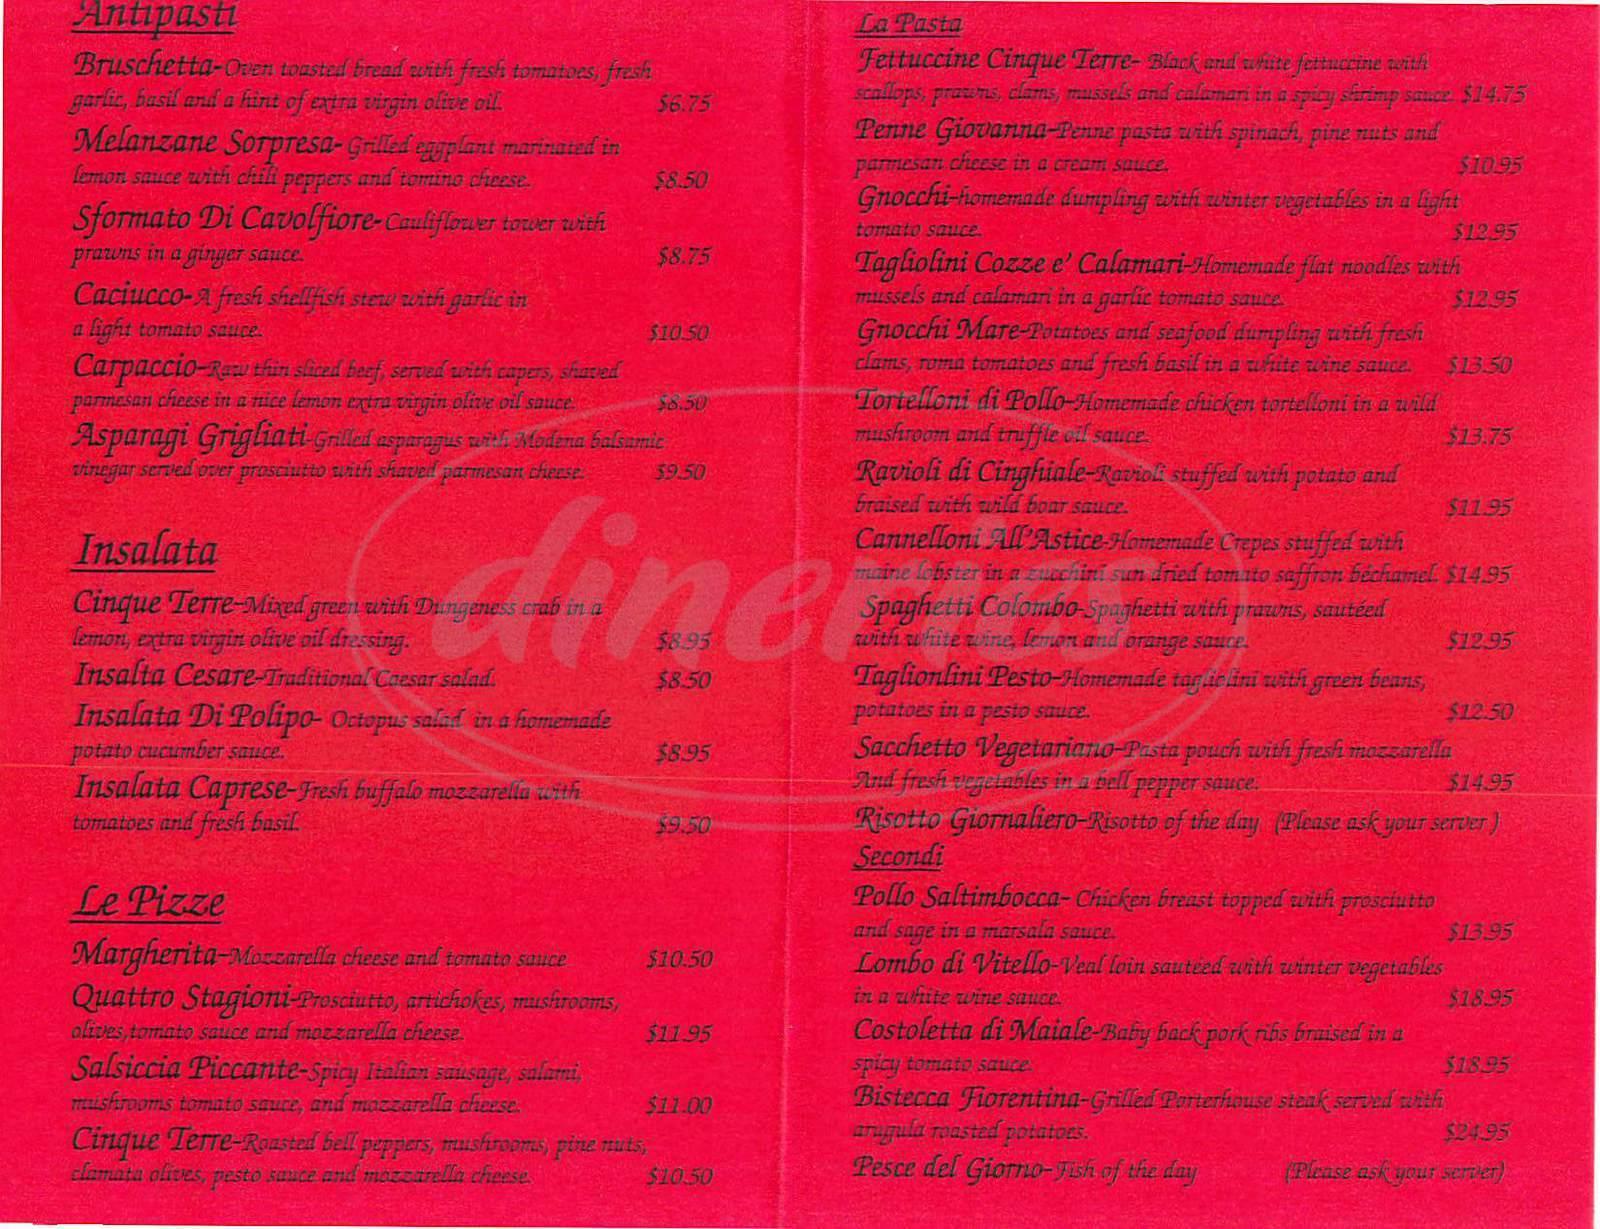 menu for Ristorante Cinque Terre